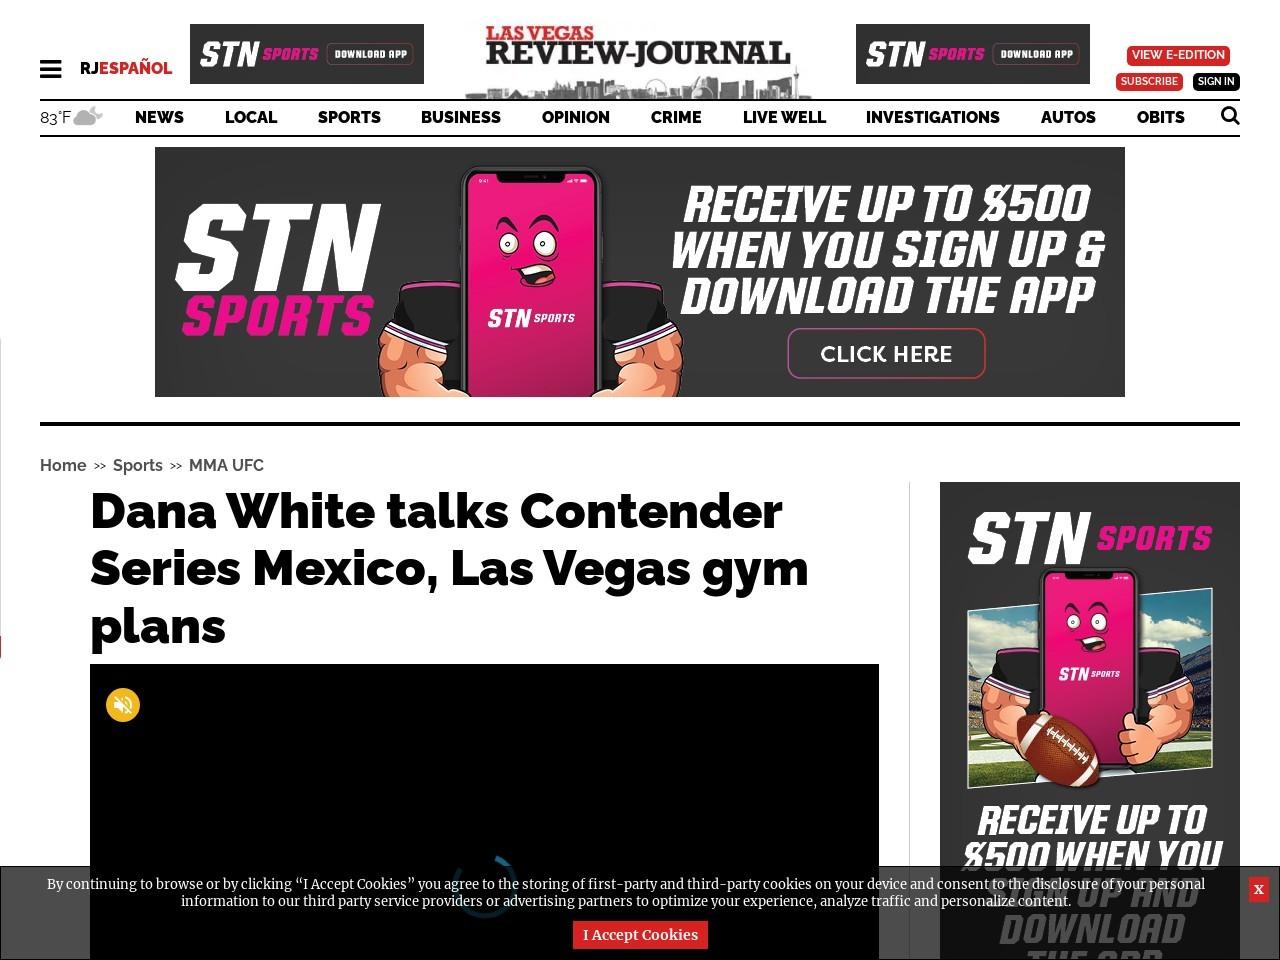 Dana White talks Contender Series Mexico, Las Vegas gym plans